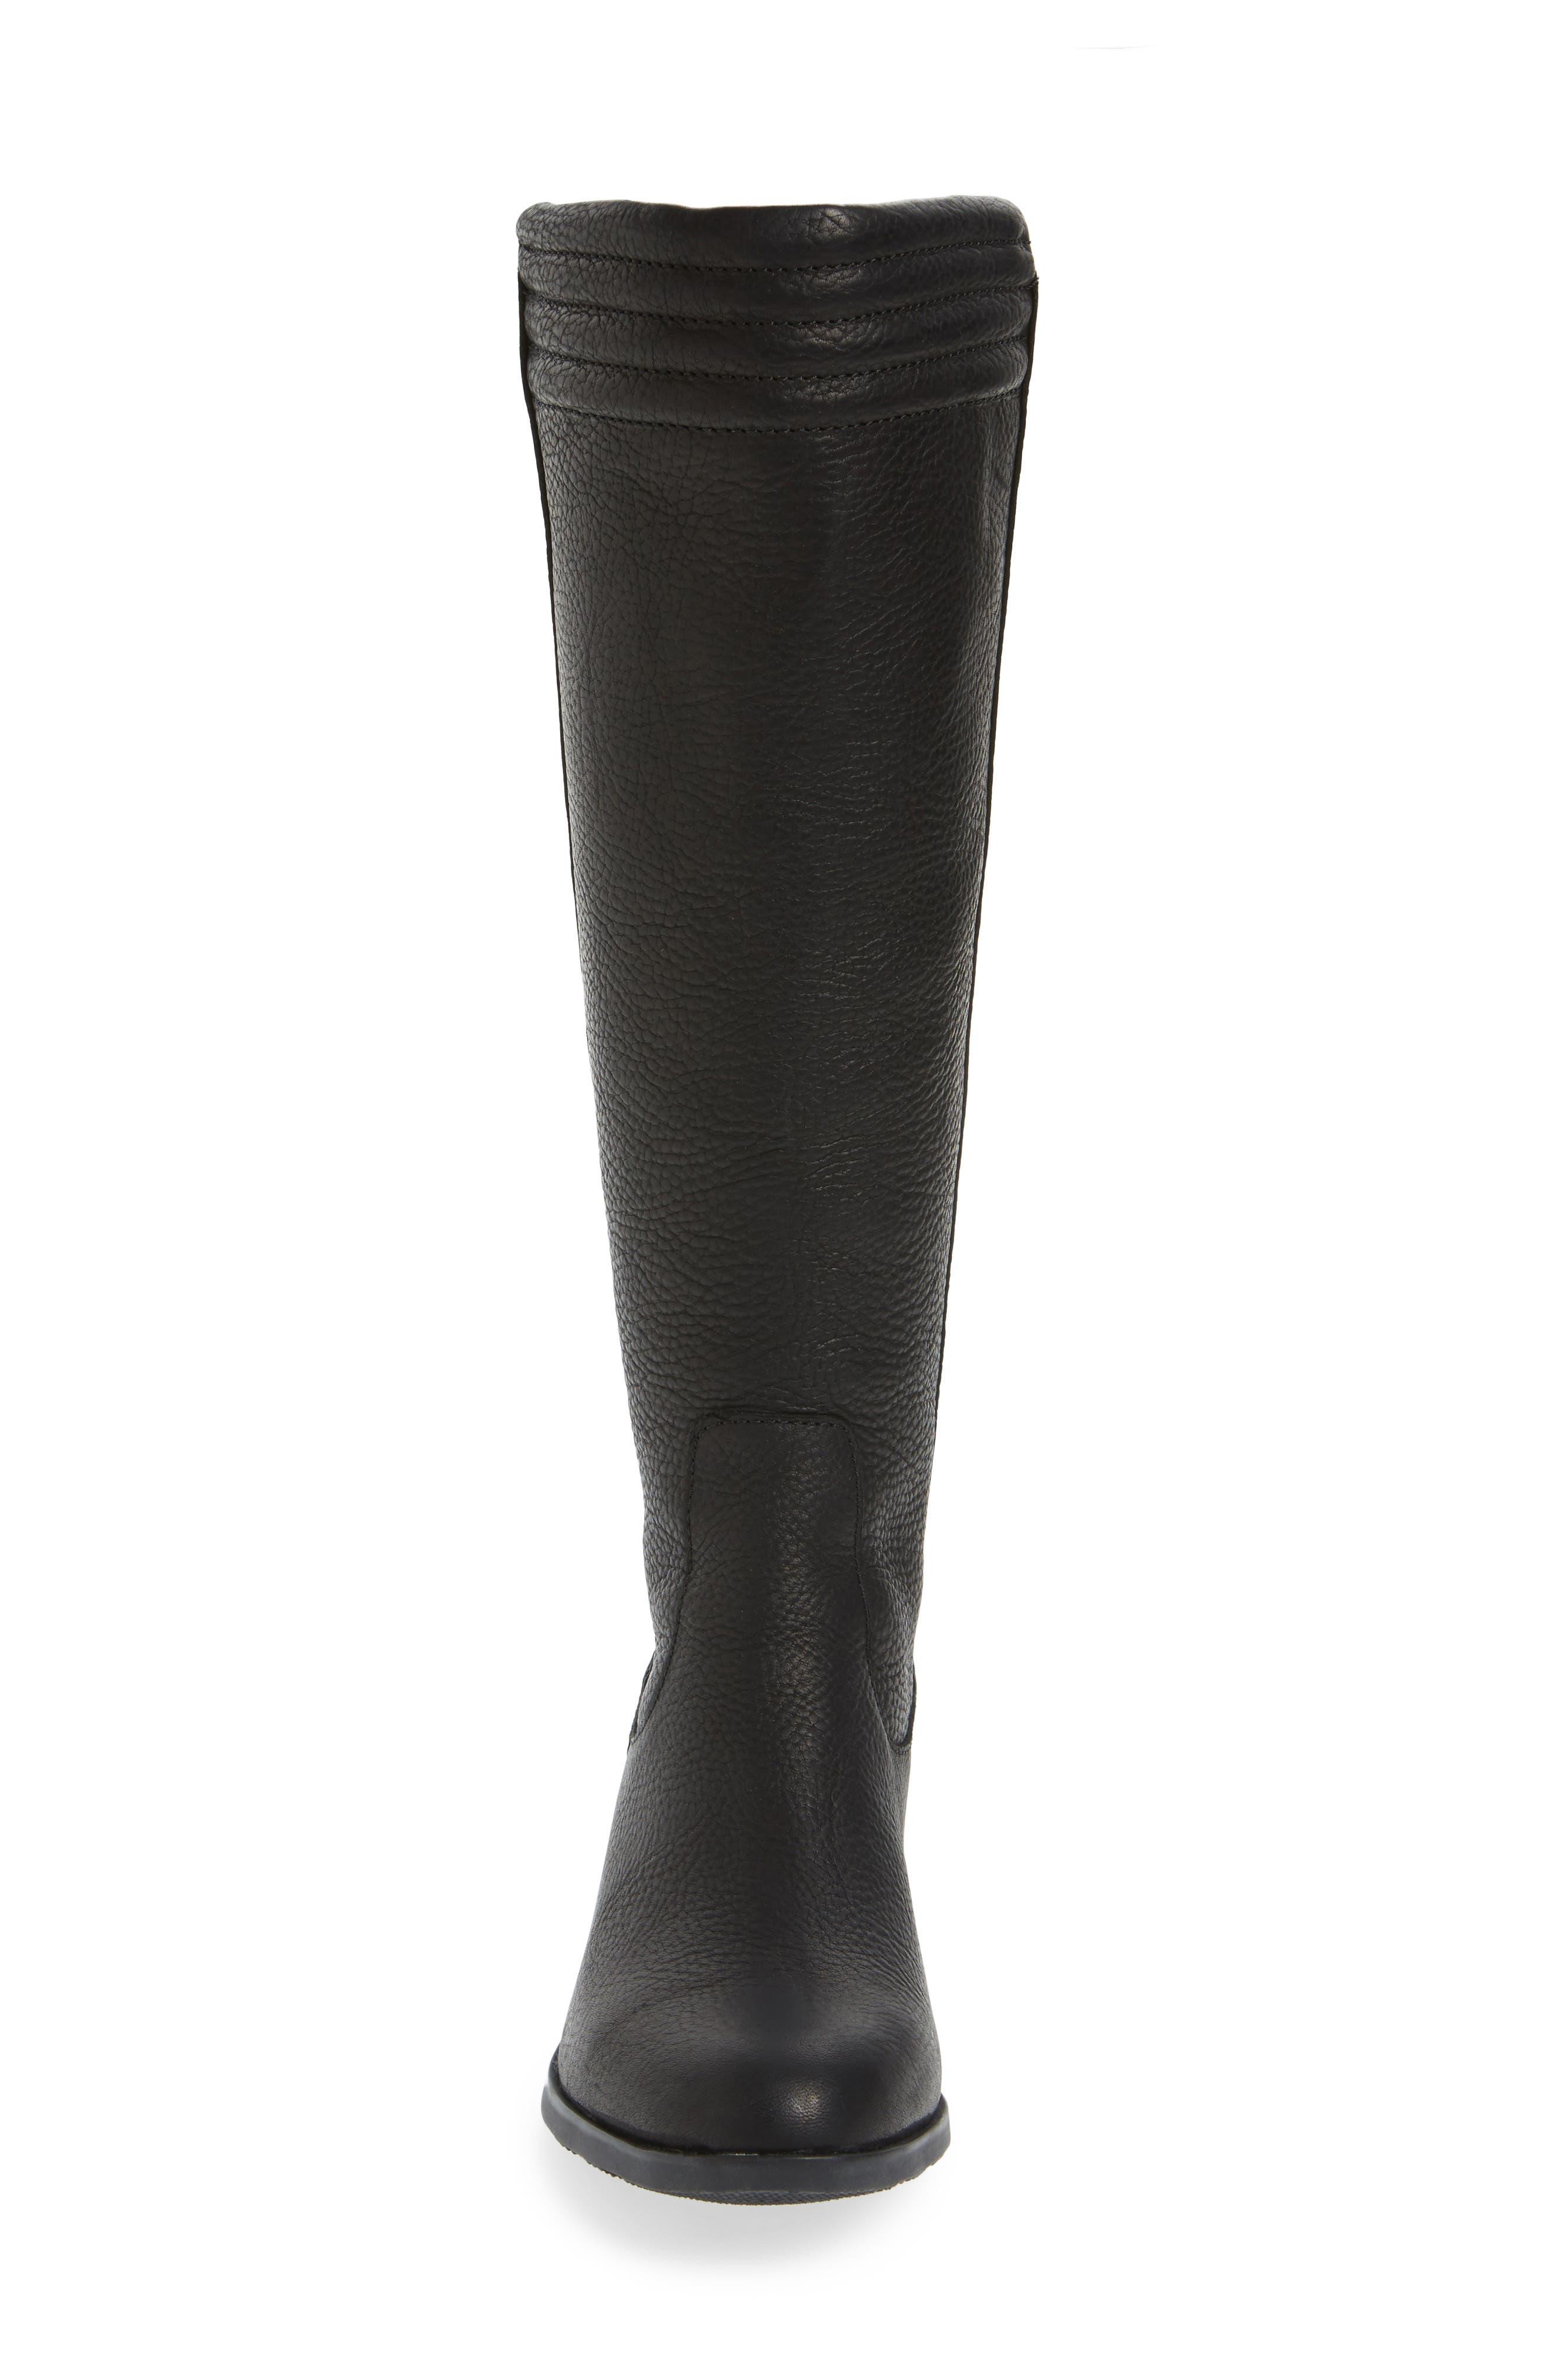 Danica Waterproof Knee High Boot,                             Alternate thumbnail 4, color,                             010